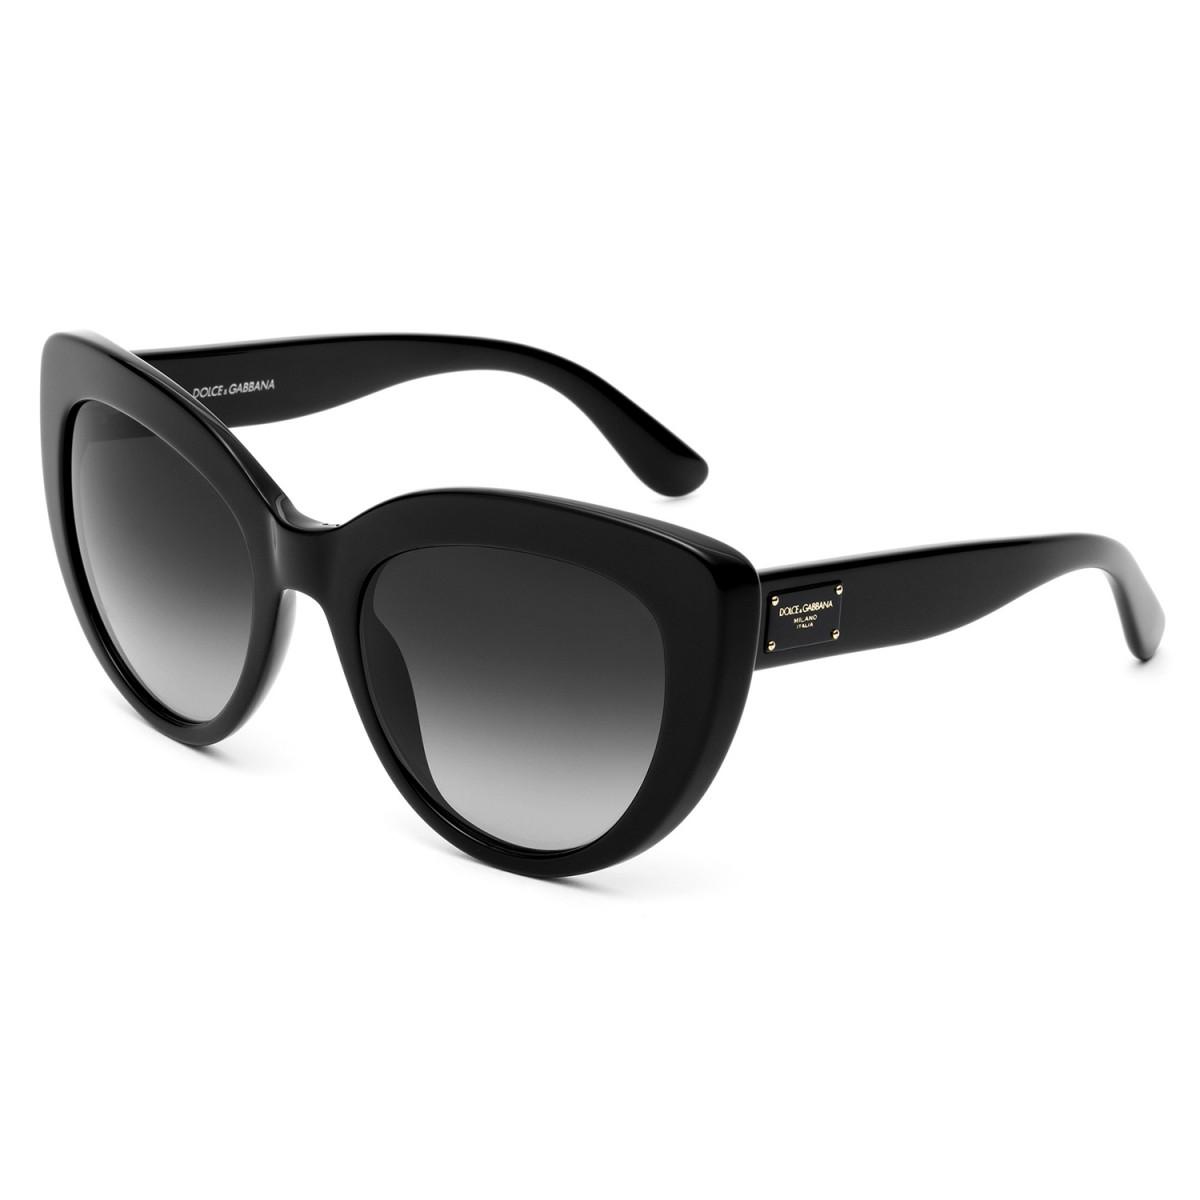 Compre Óculos de Sol Dolce   Gabbana em 10X   Tri-Jóia Shop 95de43119d